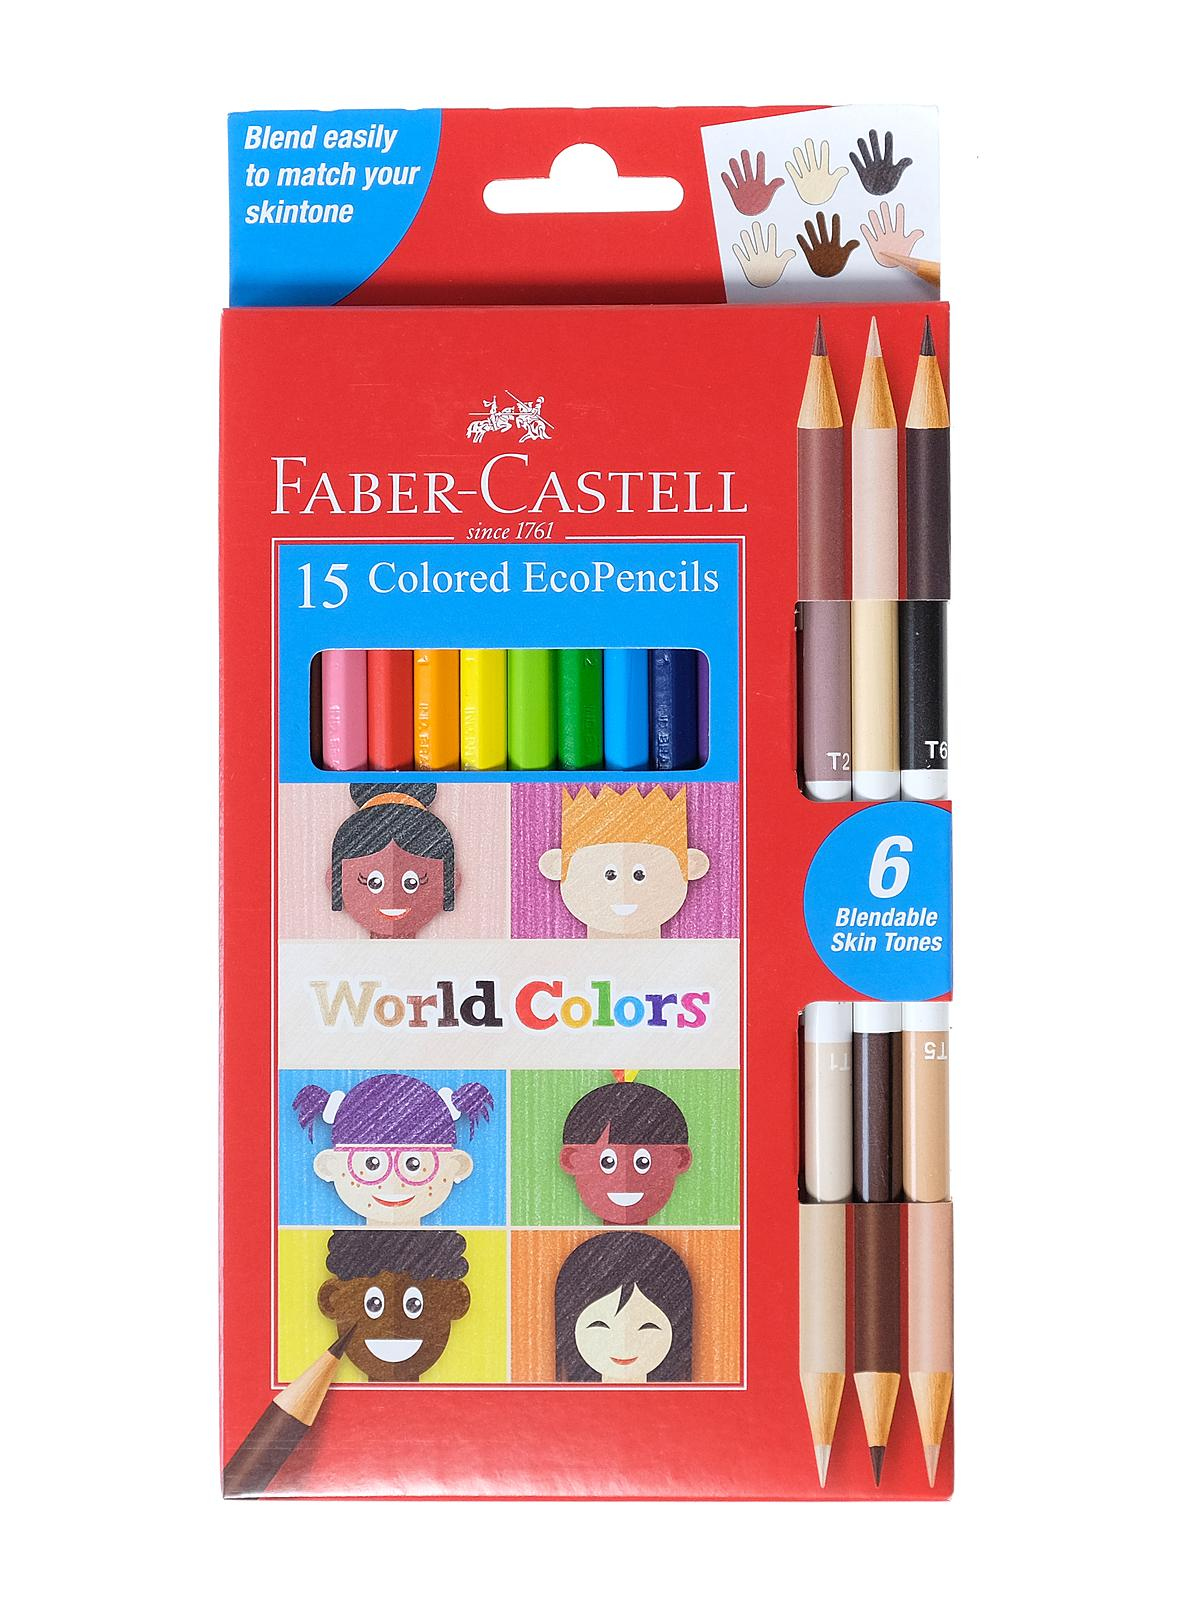 Faber-Castell - World Colors EcoPencils